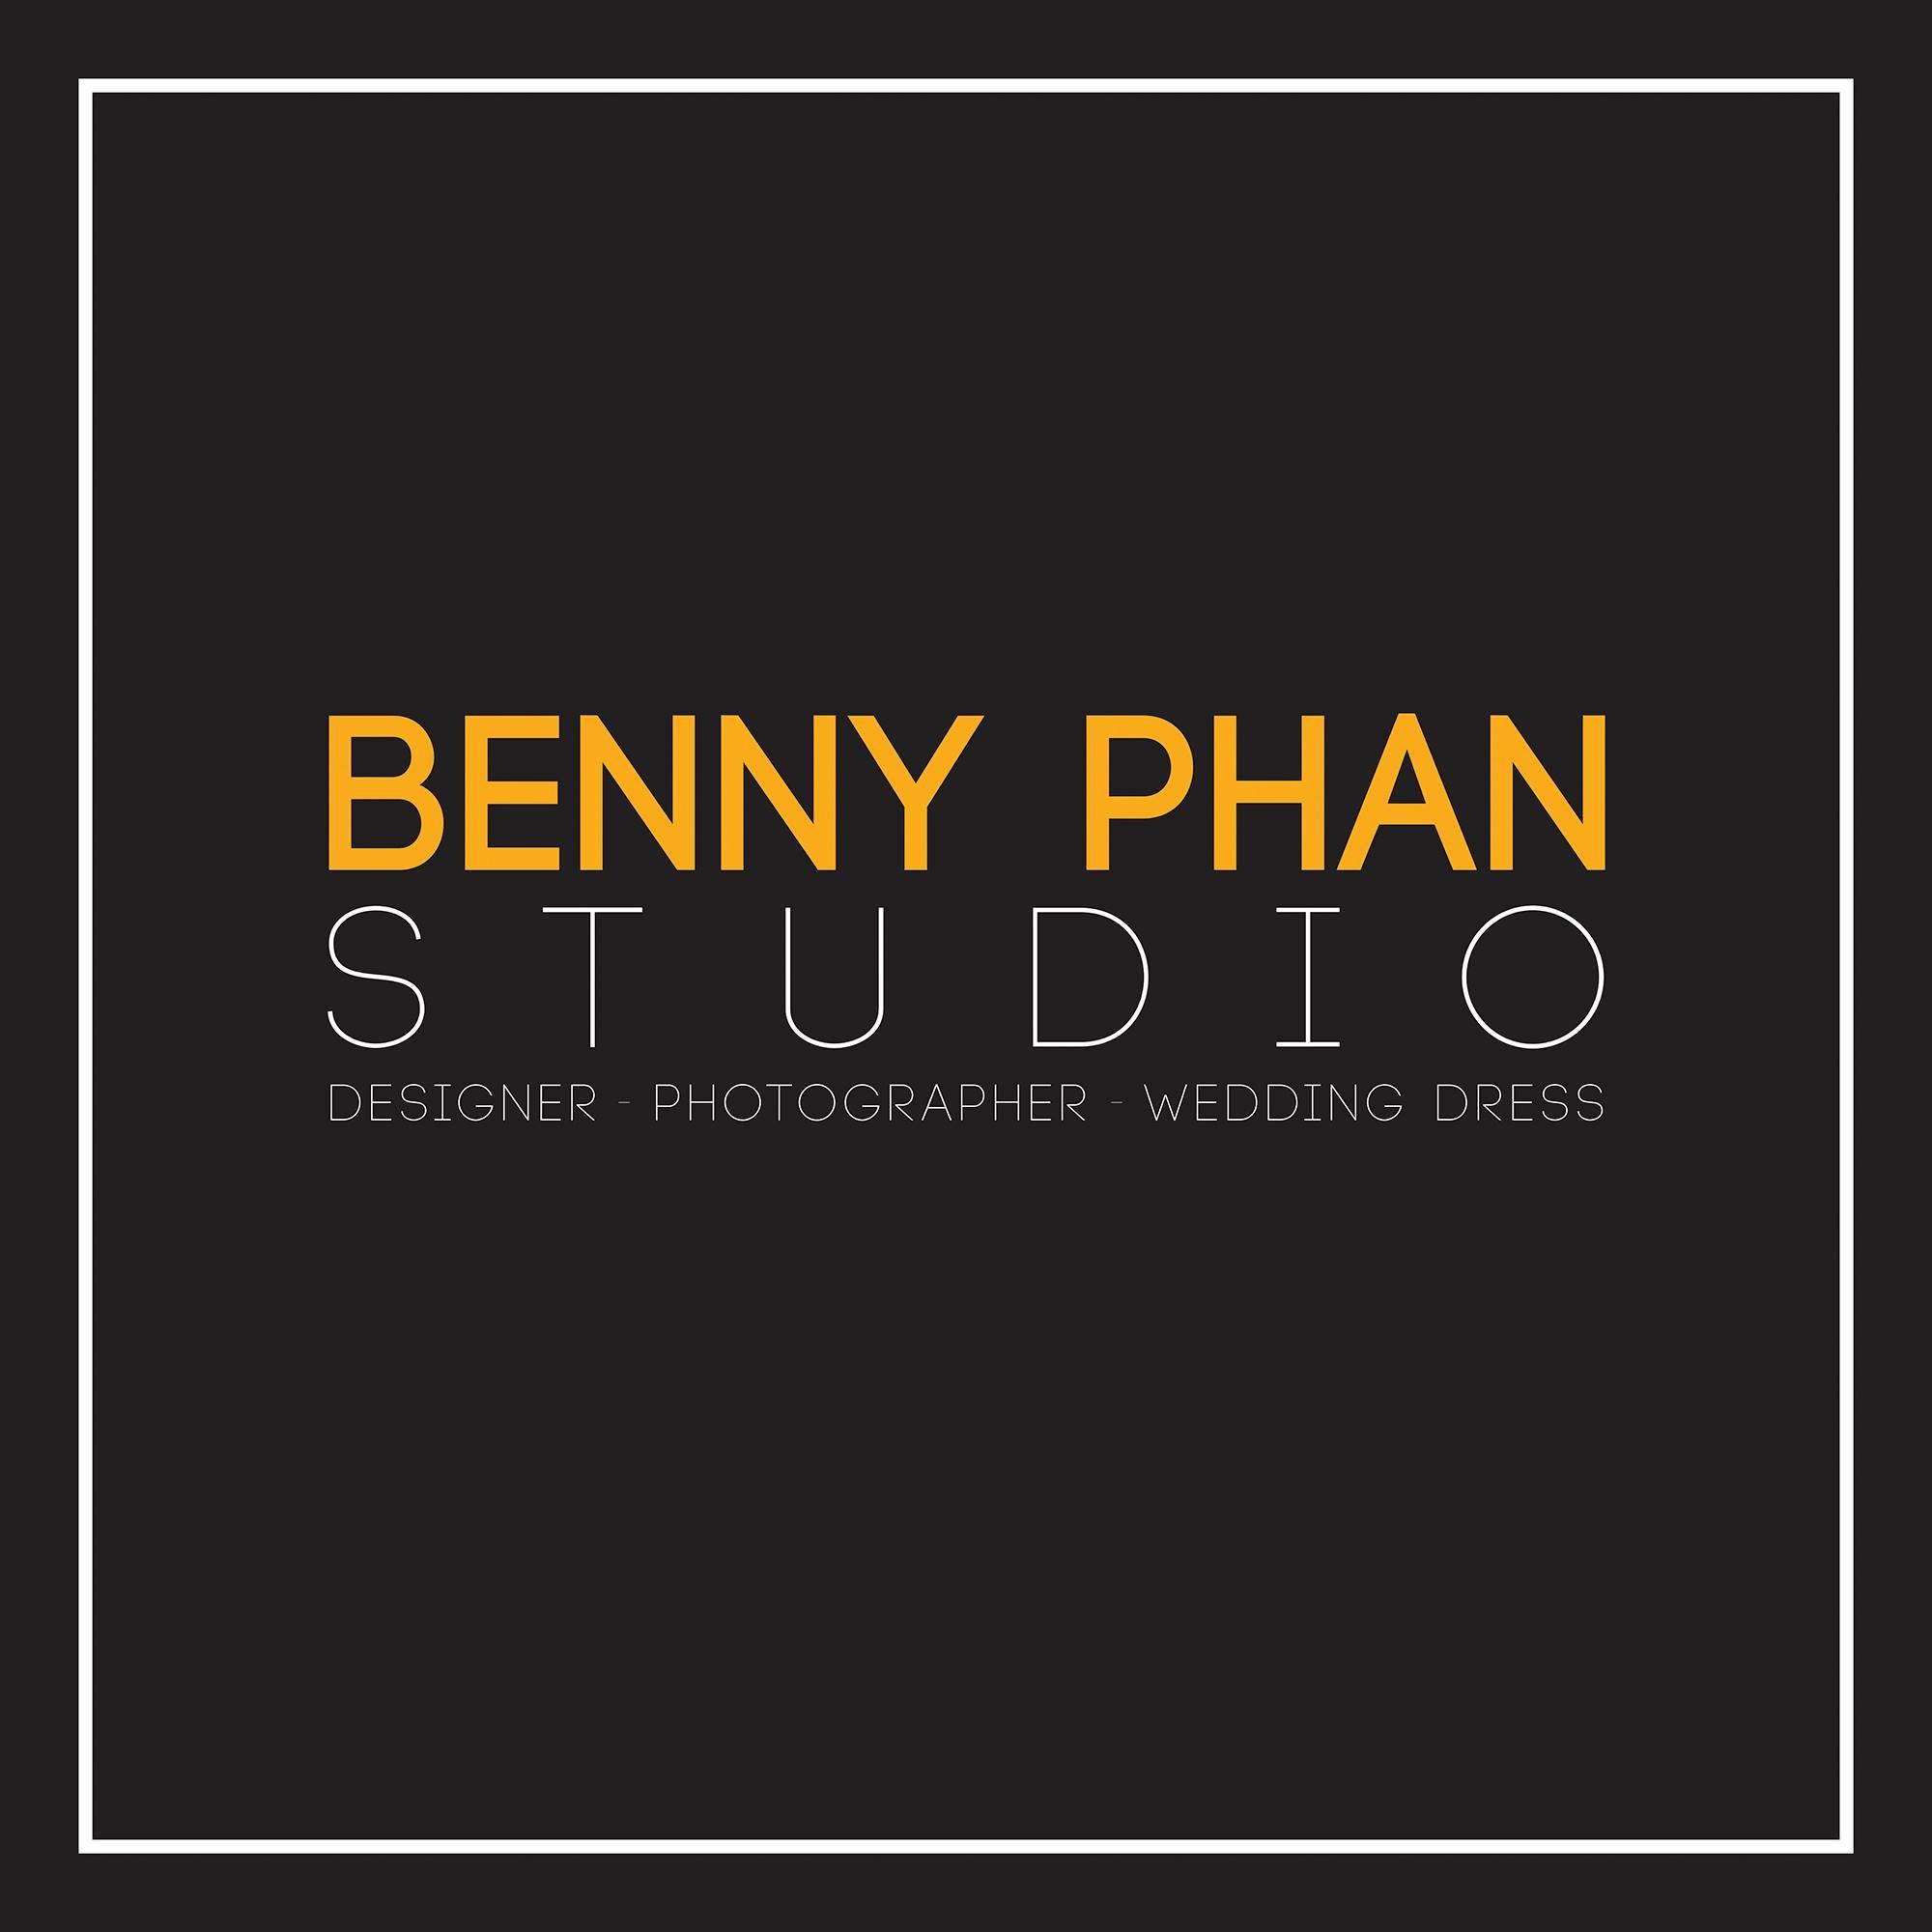 STUDIO BENNY PHAN